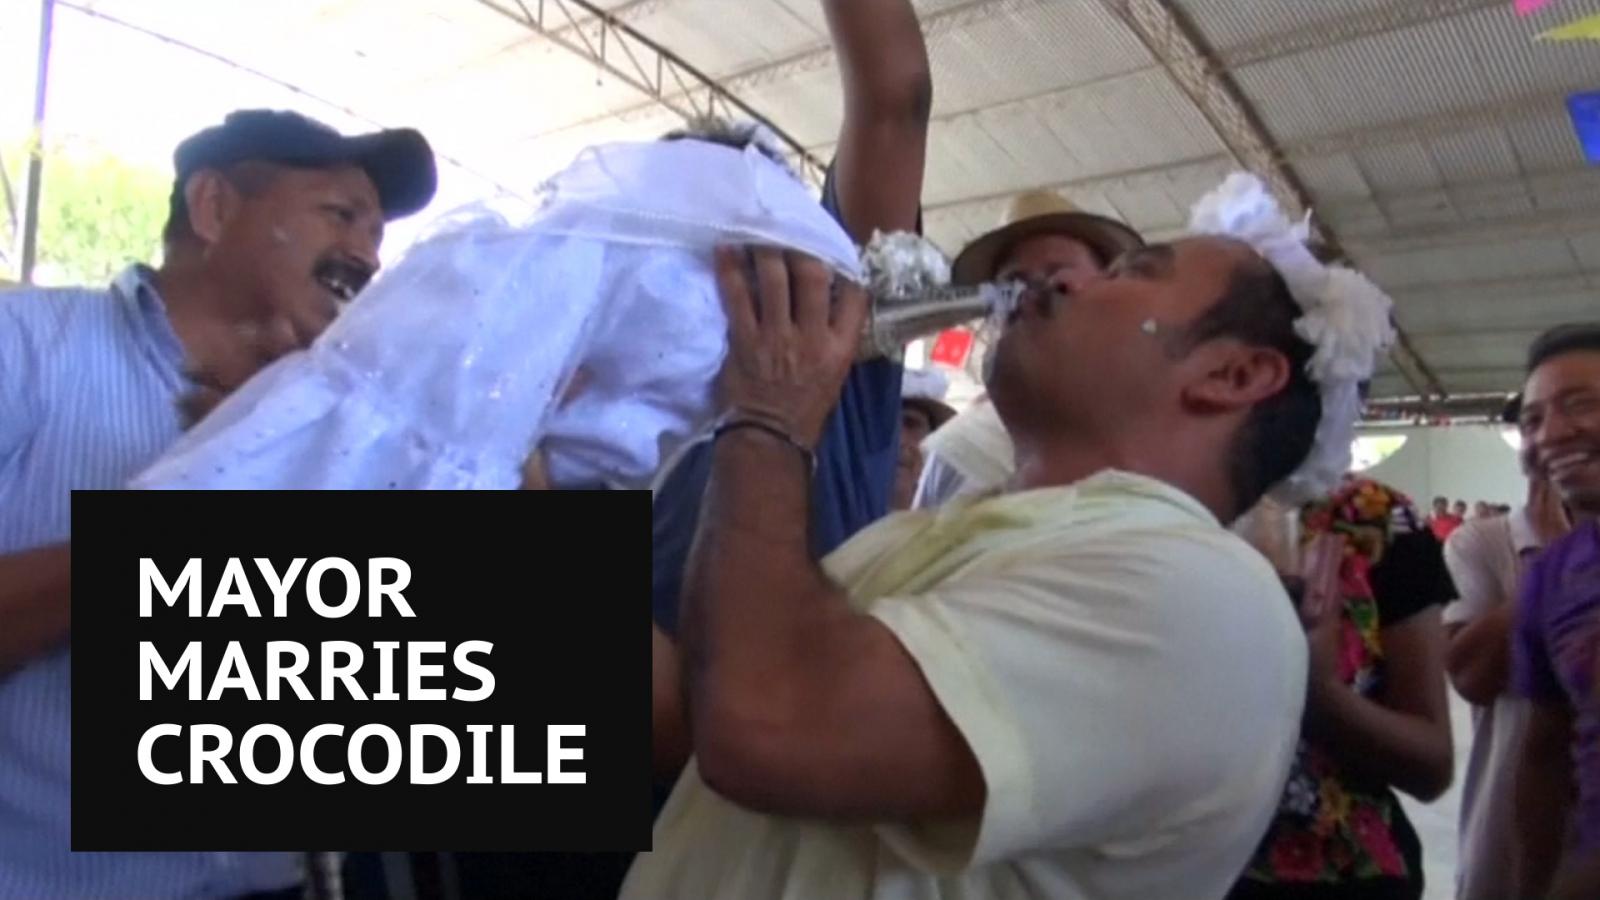 Mexican Mayor Weds Crocodile Called 'The Princess'